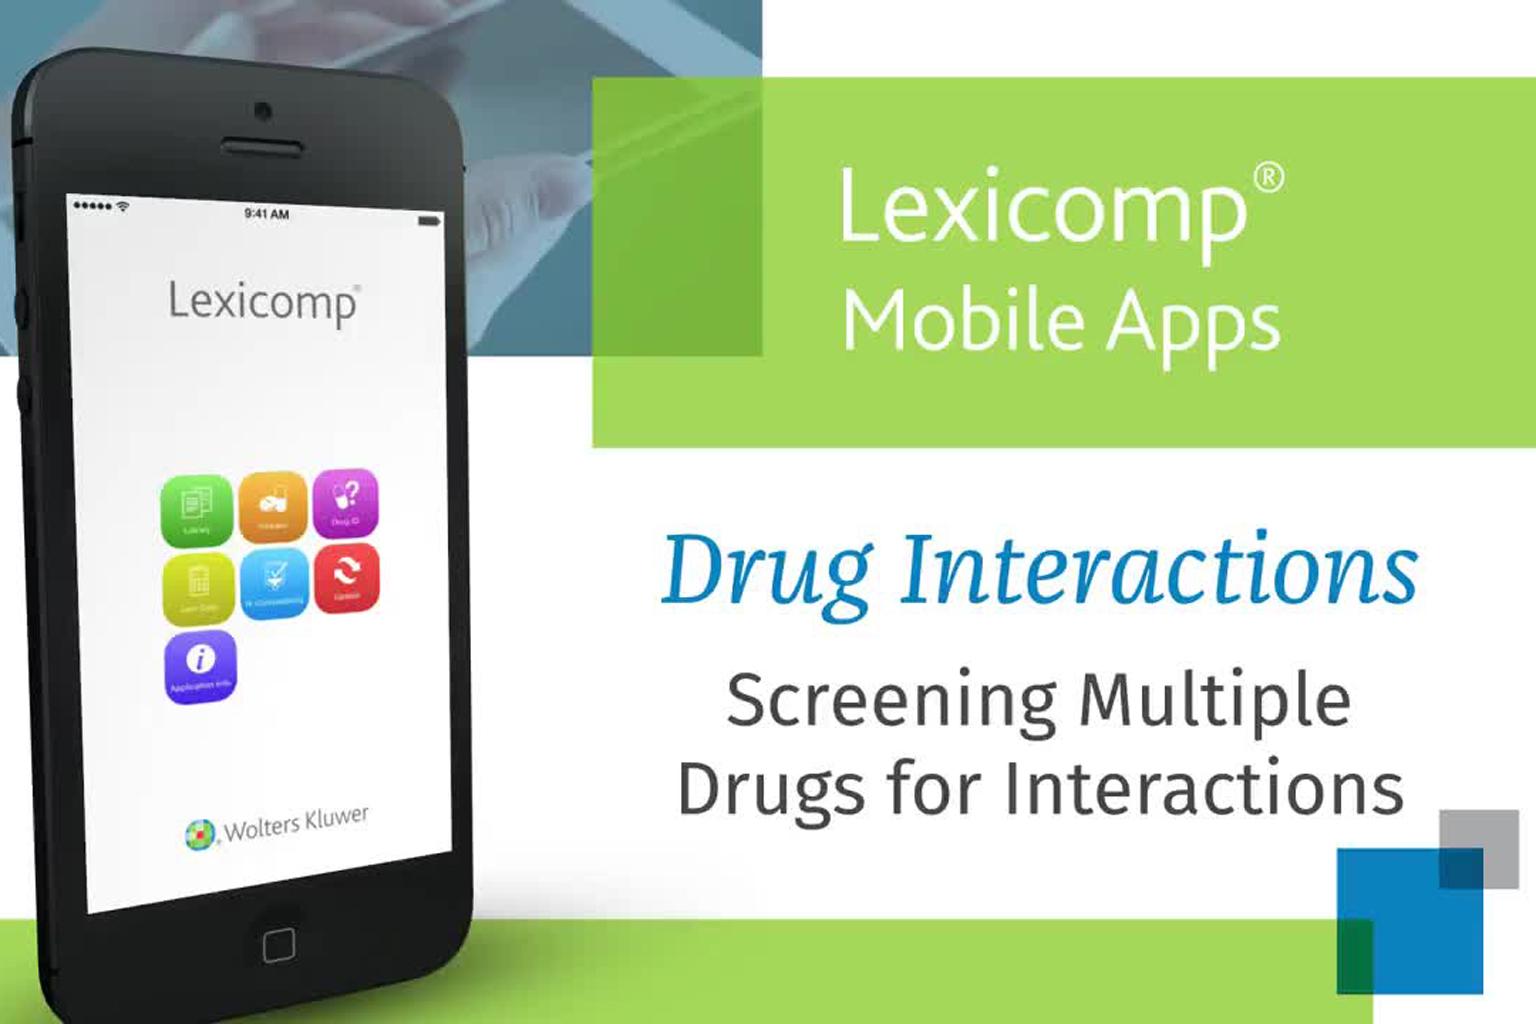 video screen - Lexicomp Mobile App Interactions Checking